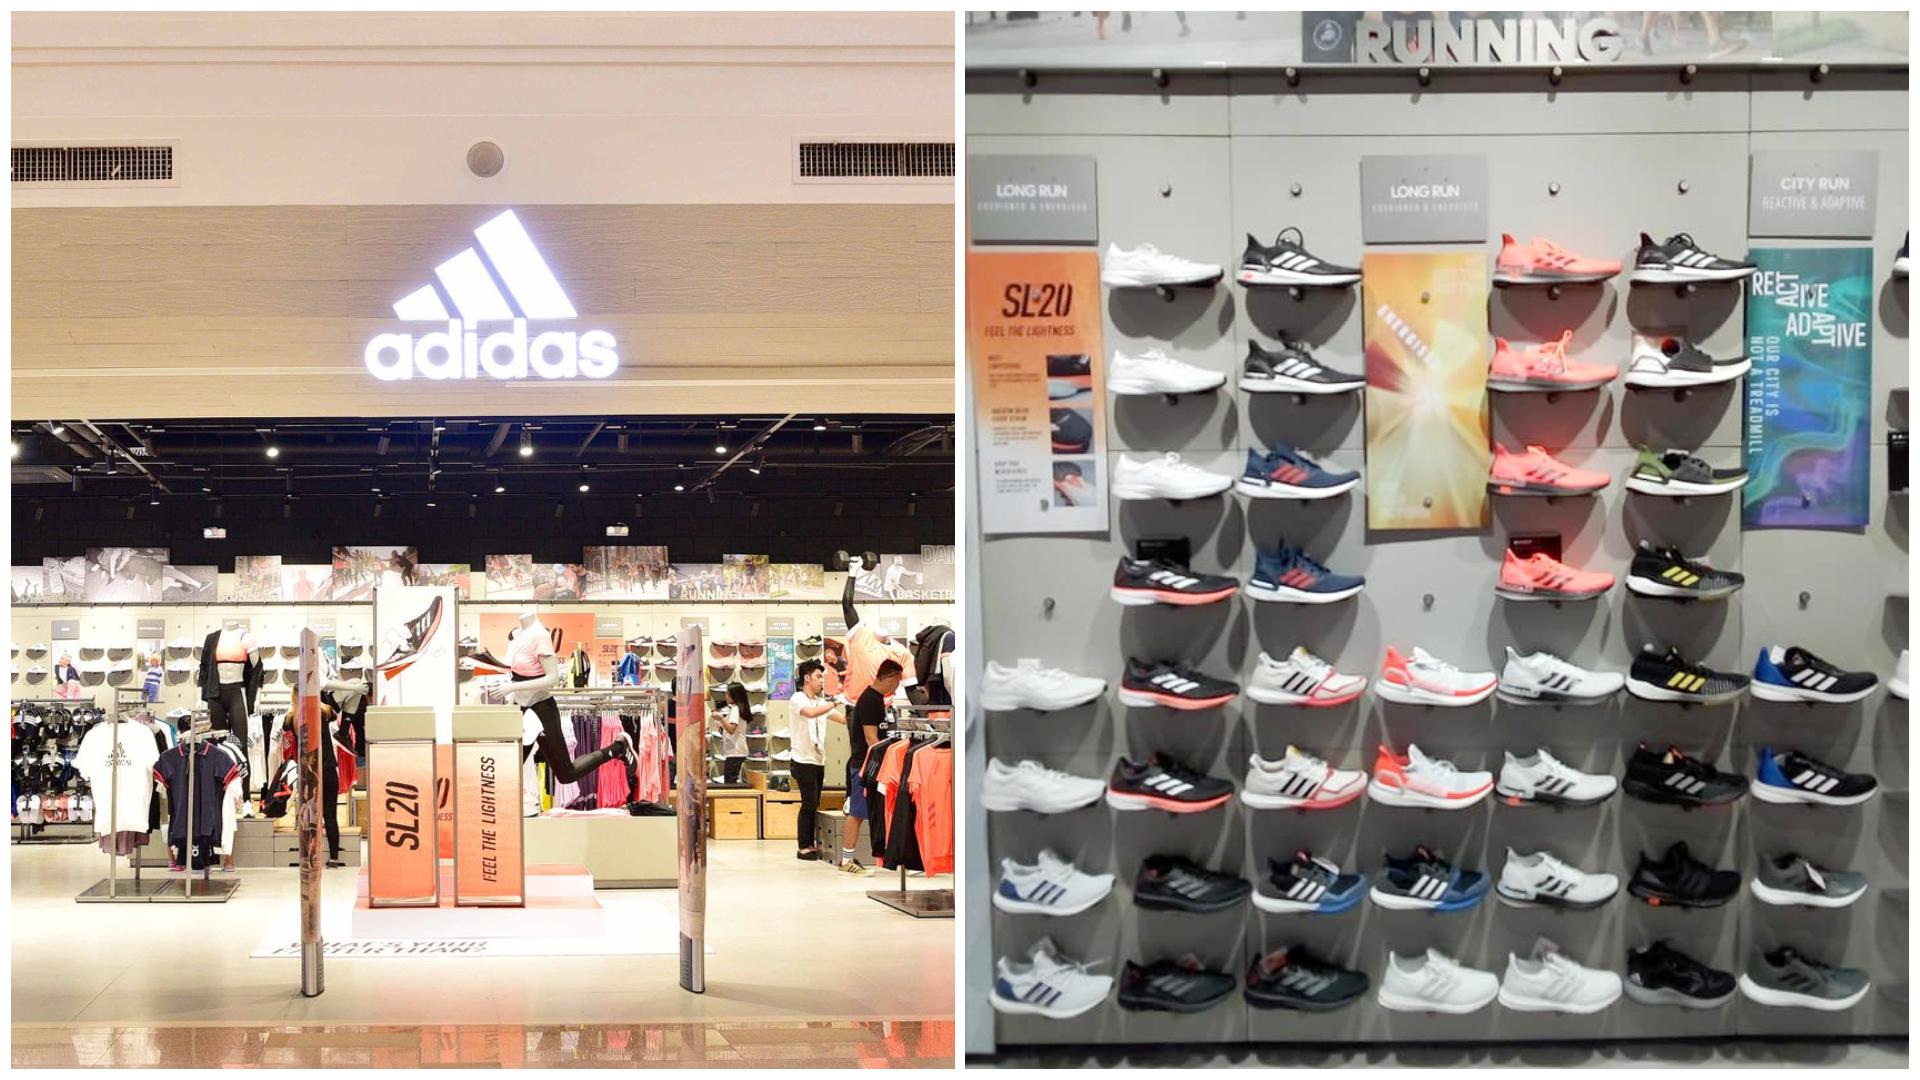 Adidas branch in Cebu City